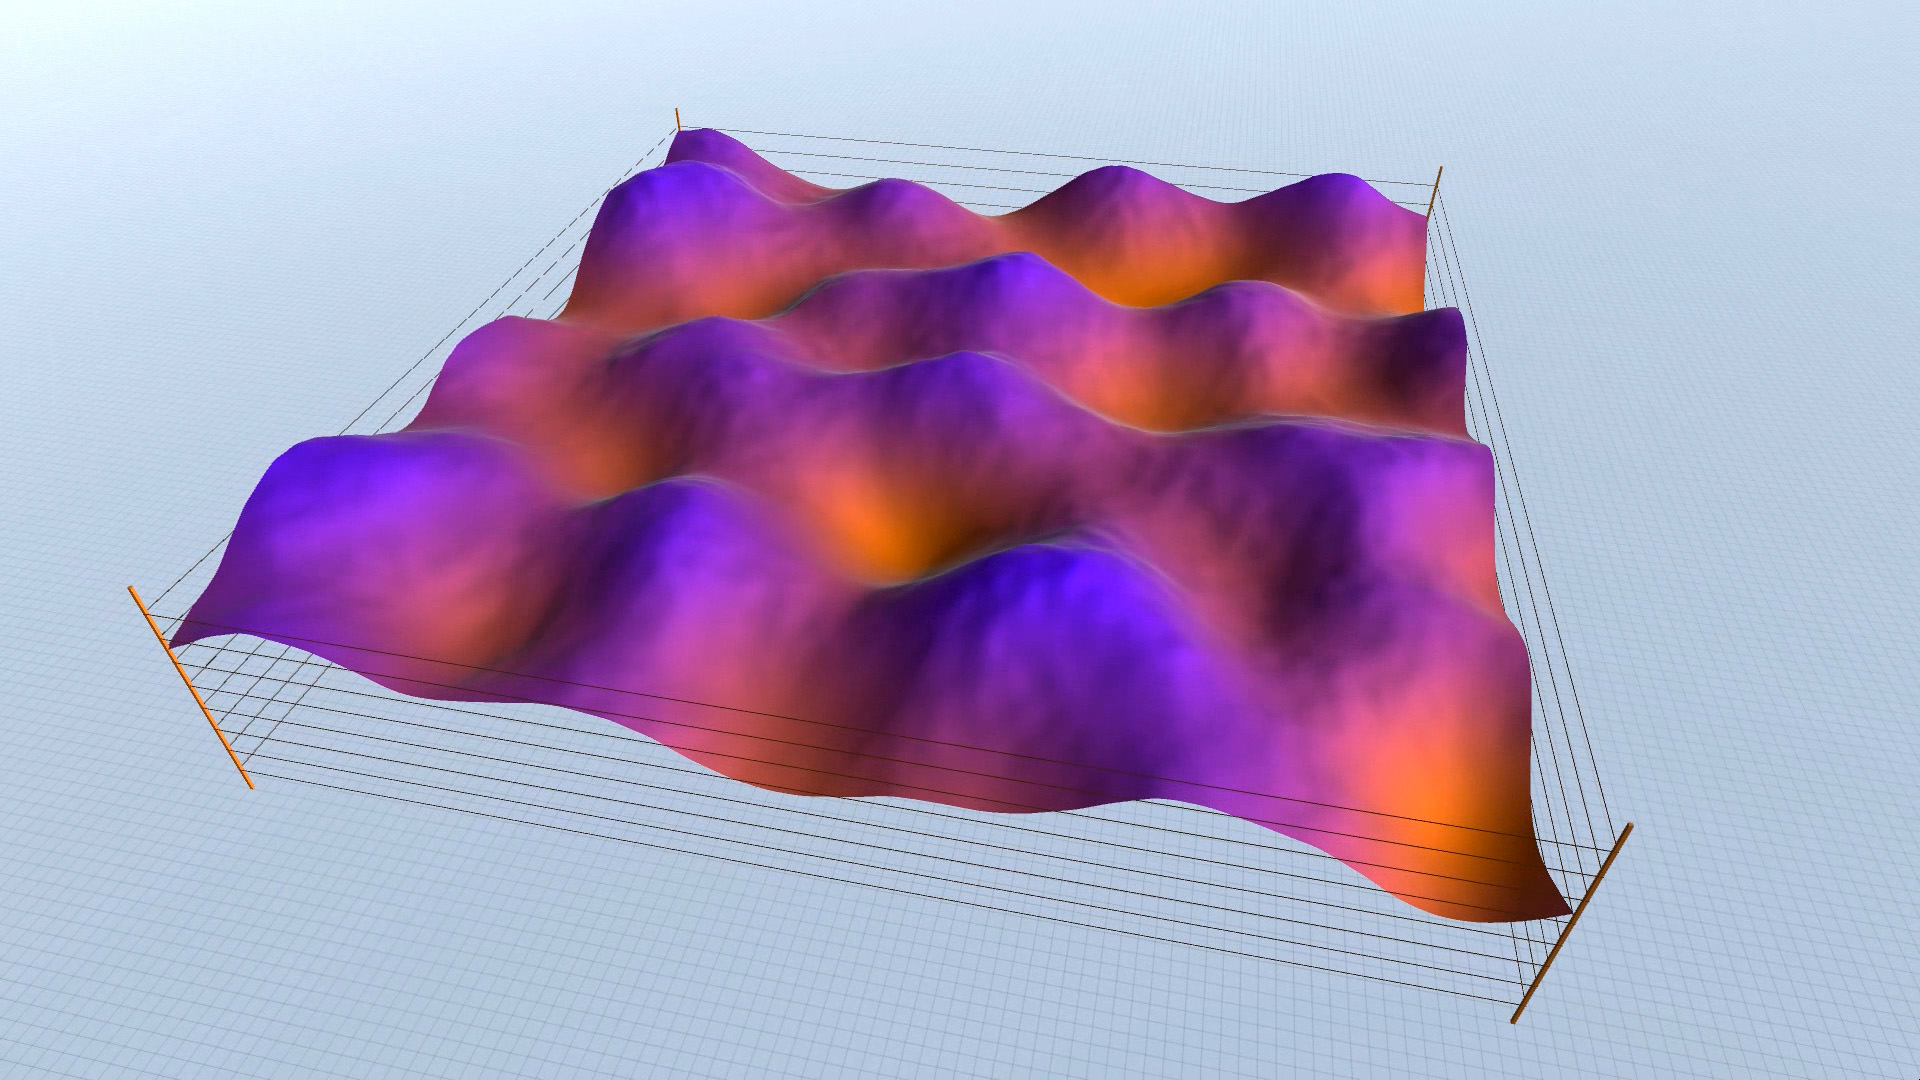 konsfik-procedural-landscape-animated-play-mode-screenshot-3